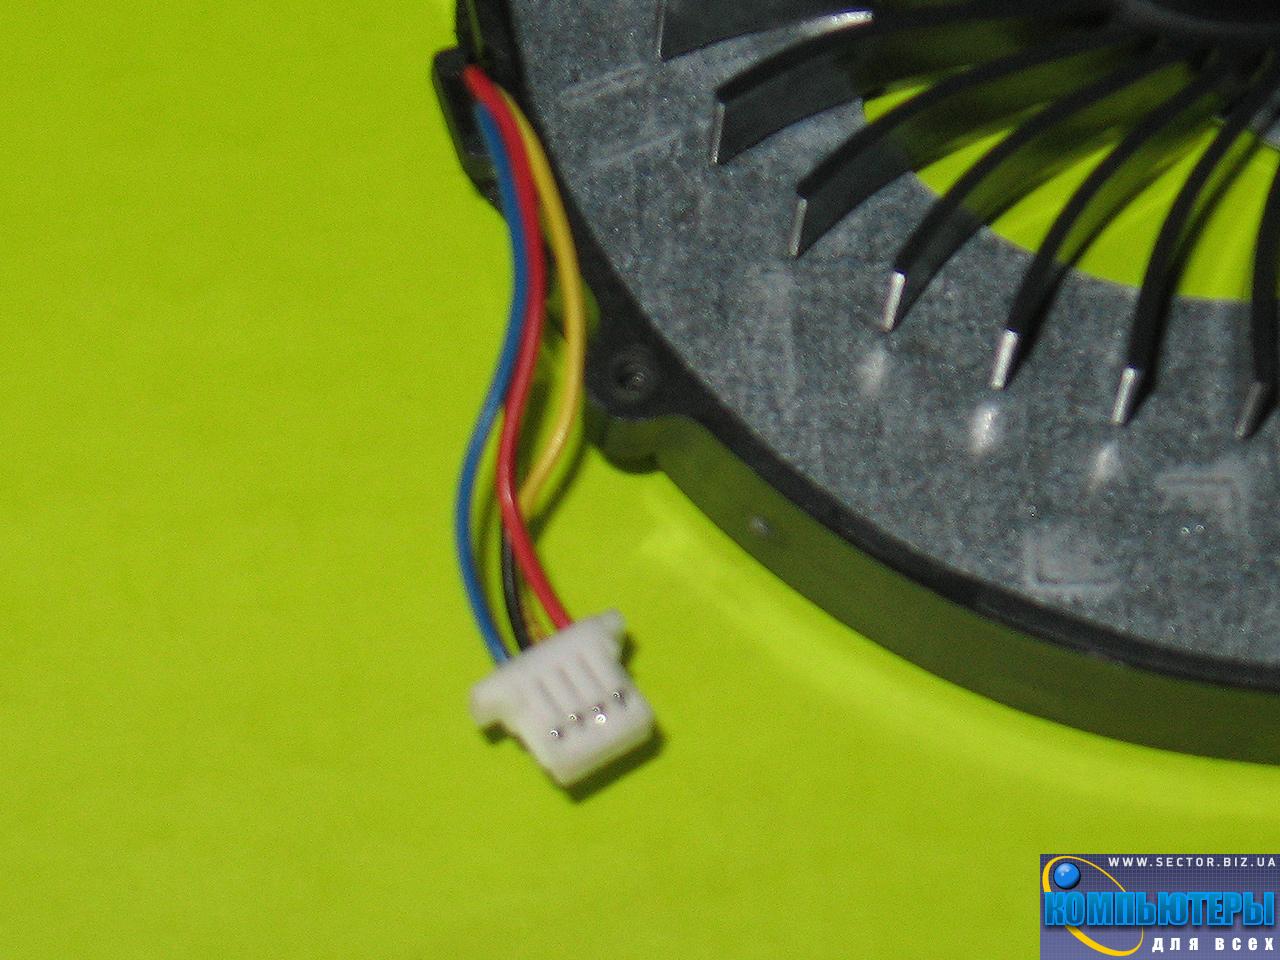 Кулер к ноутбуку Lenovo B570 V570 V570A Z570 p/n: AD0705HX09KB00. Фото № 1.